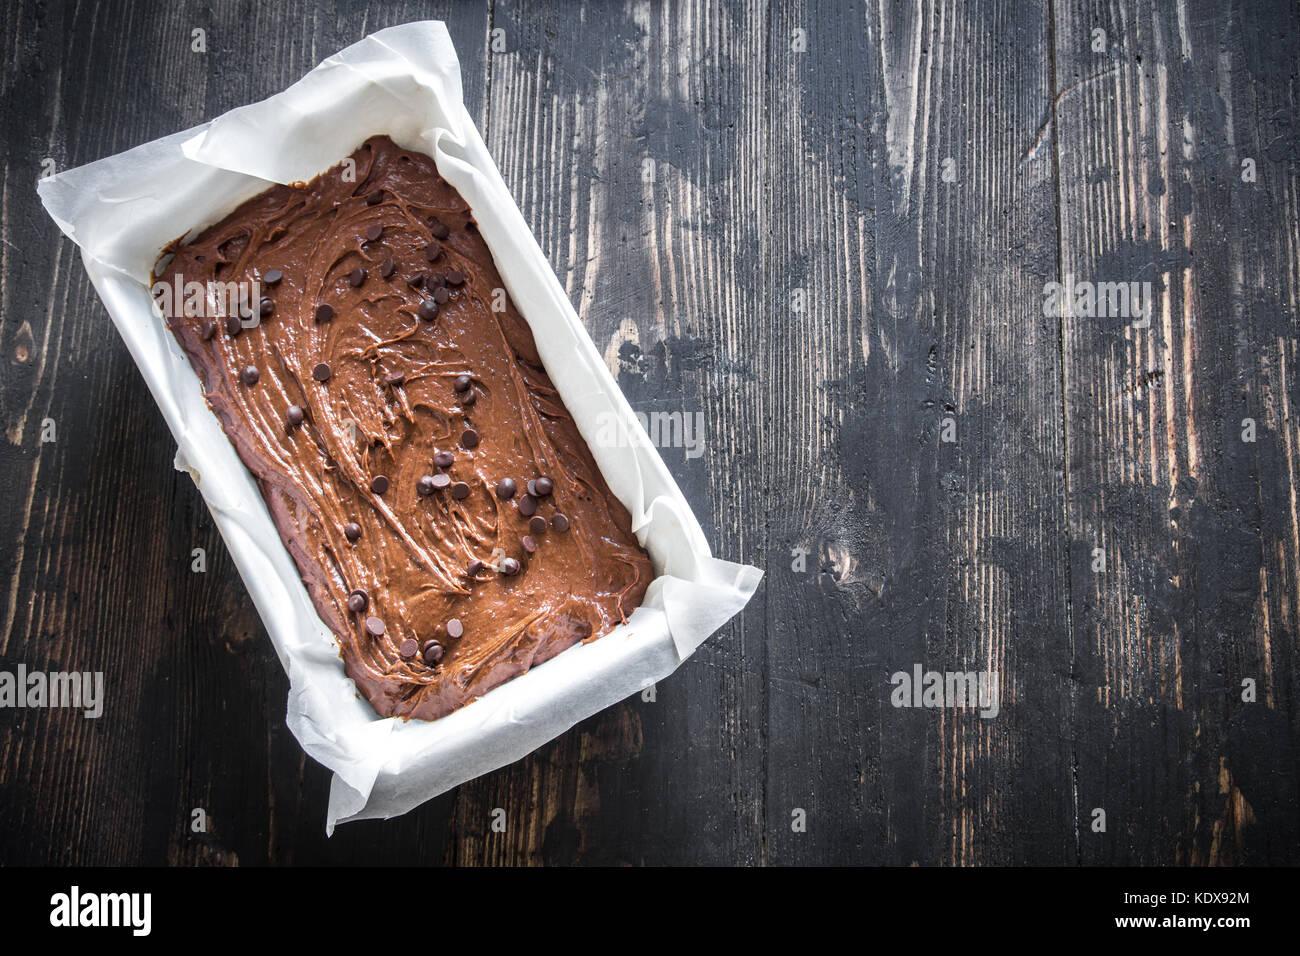 Basic homemade brownie or chocolate cake raw dough in baking pan. Cooking (baking) homemade chocolate cake or brownie. - Stock Image